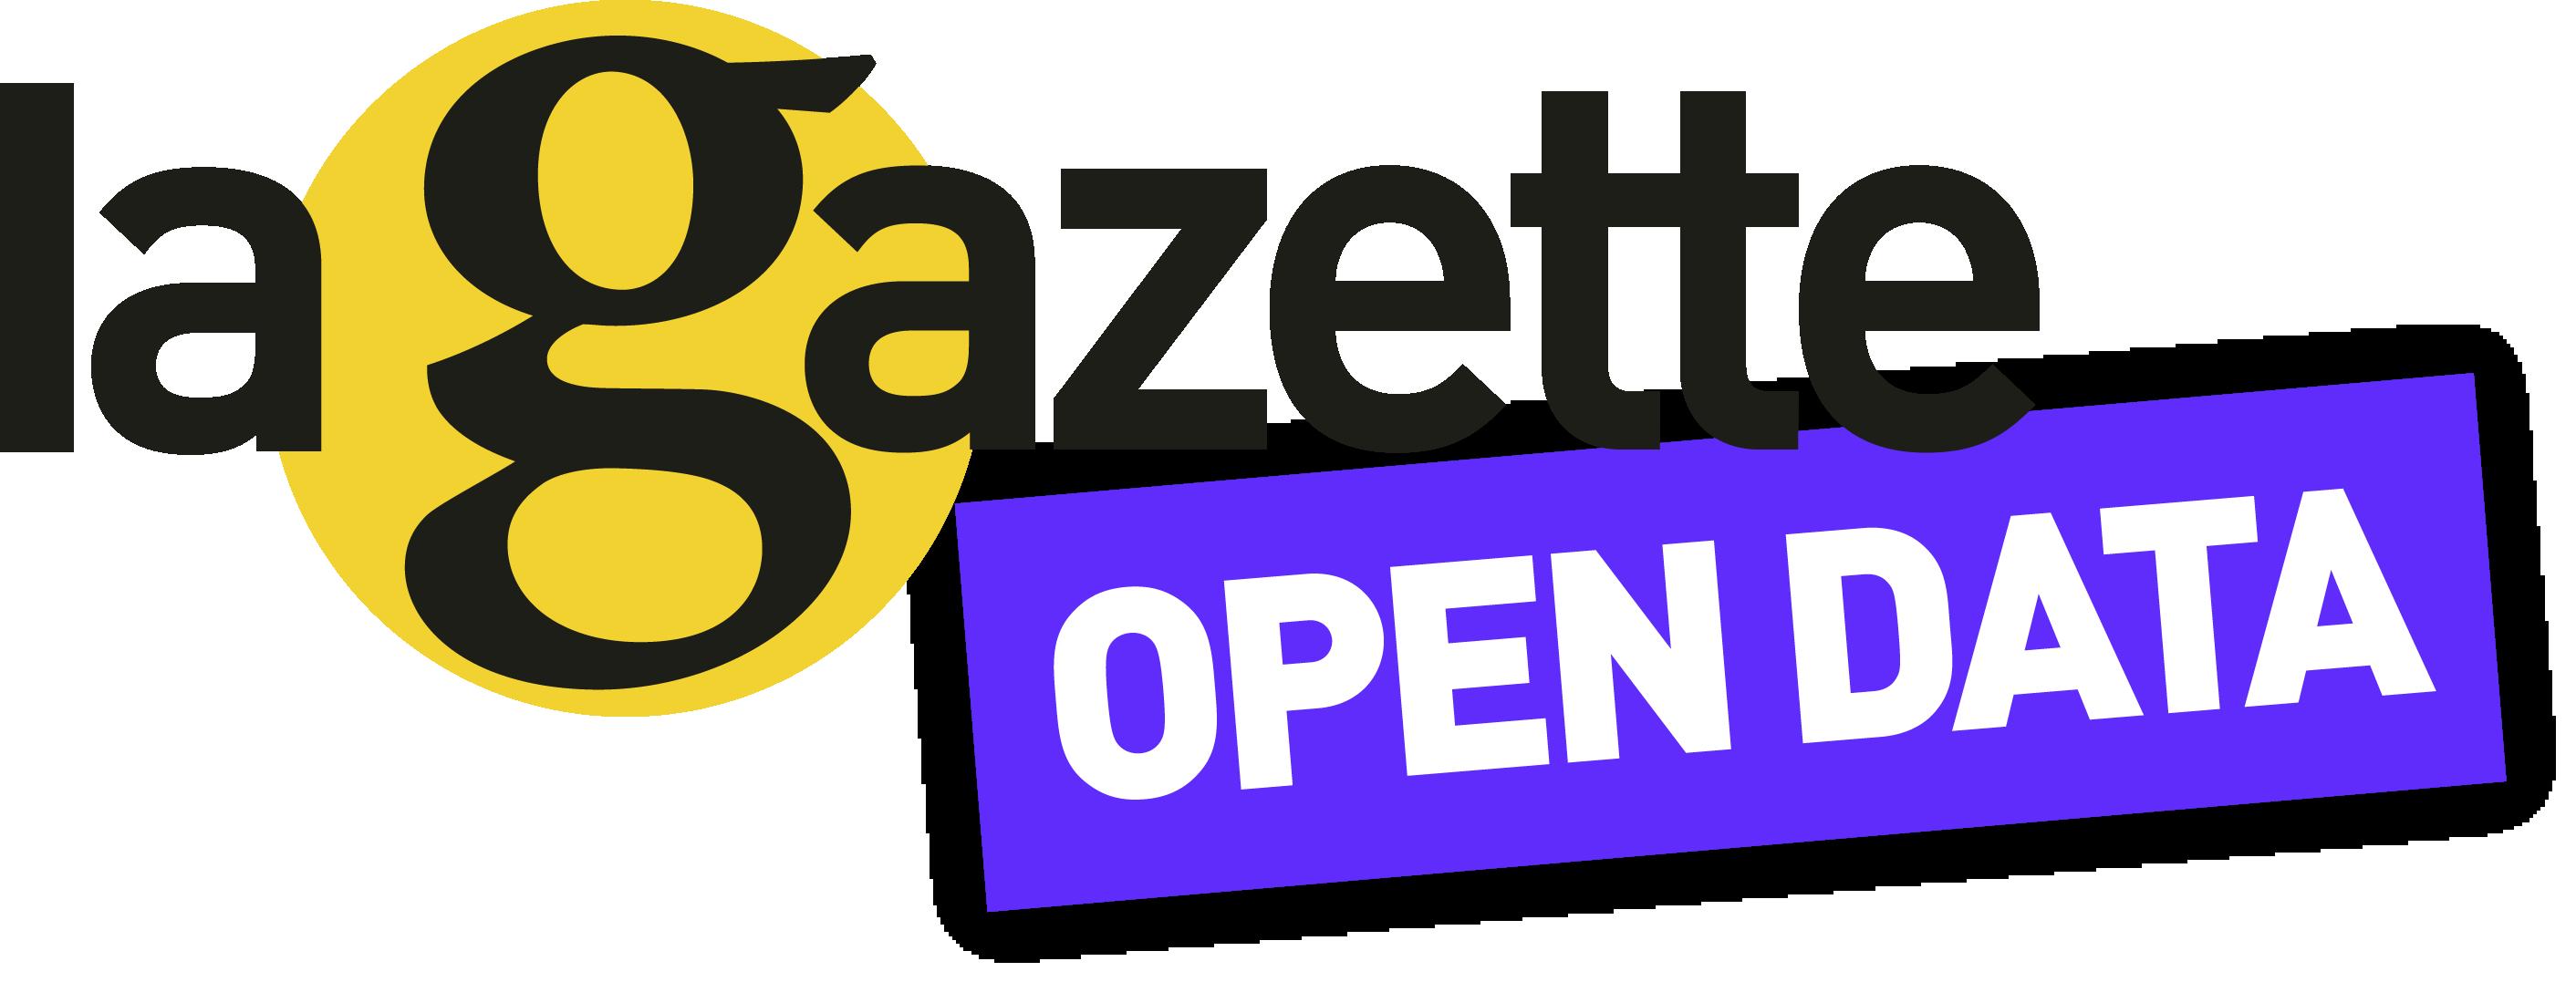 Open Data Gazette